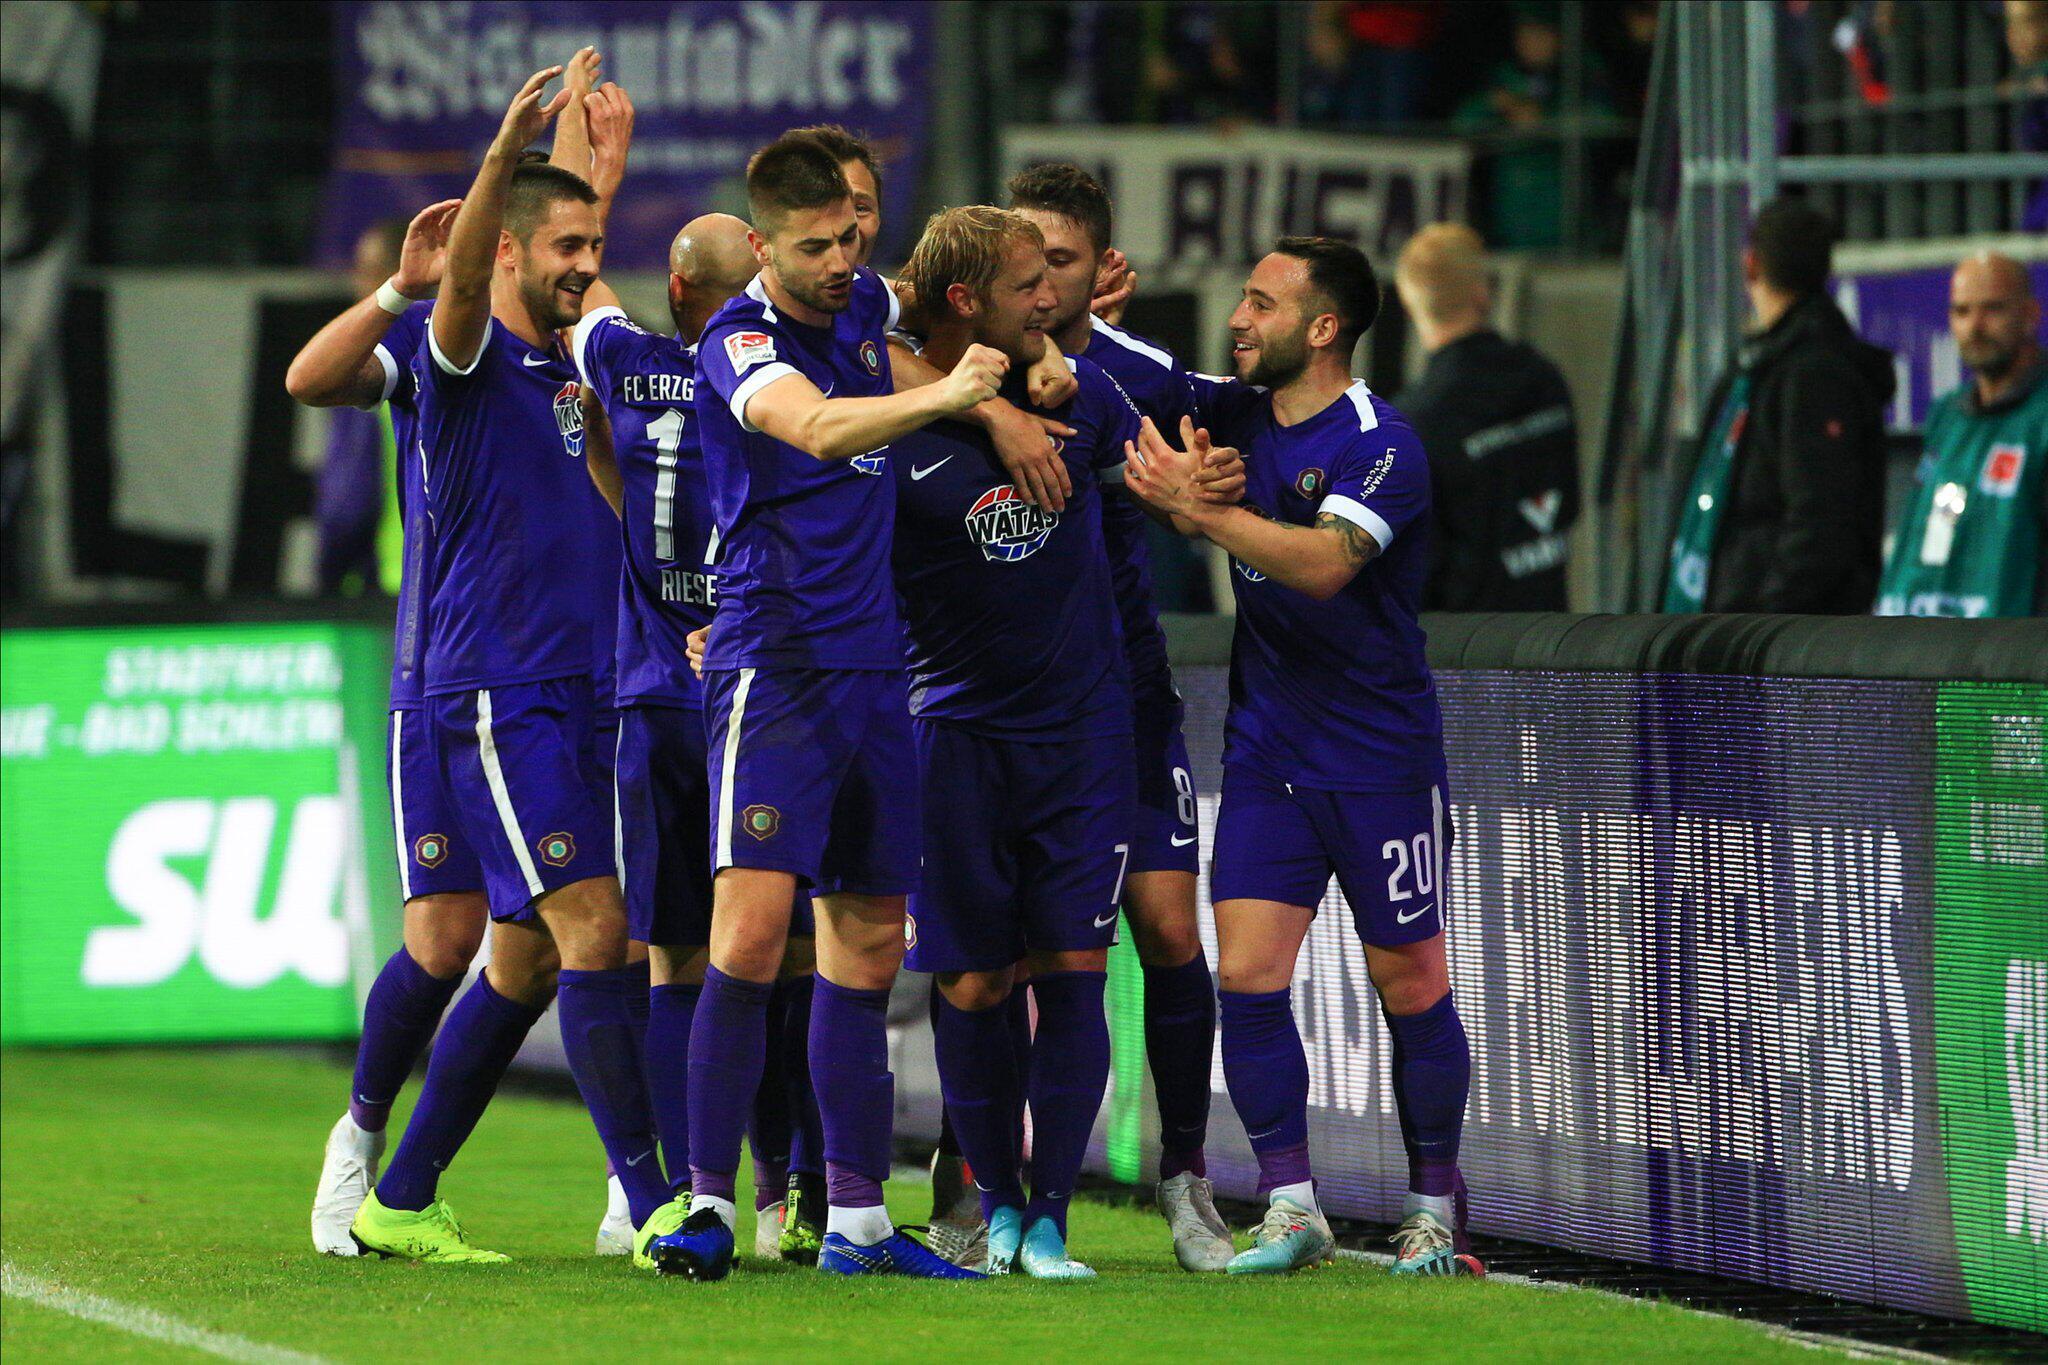 Bild zu Erzgebirge Aue - 1. FC Nürnberg